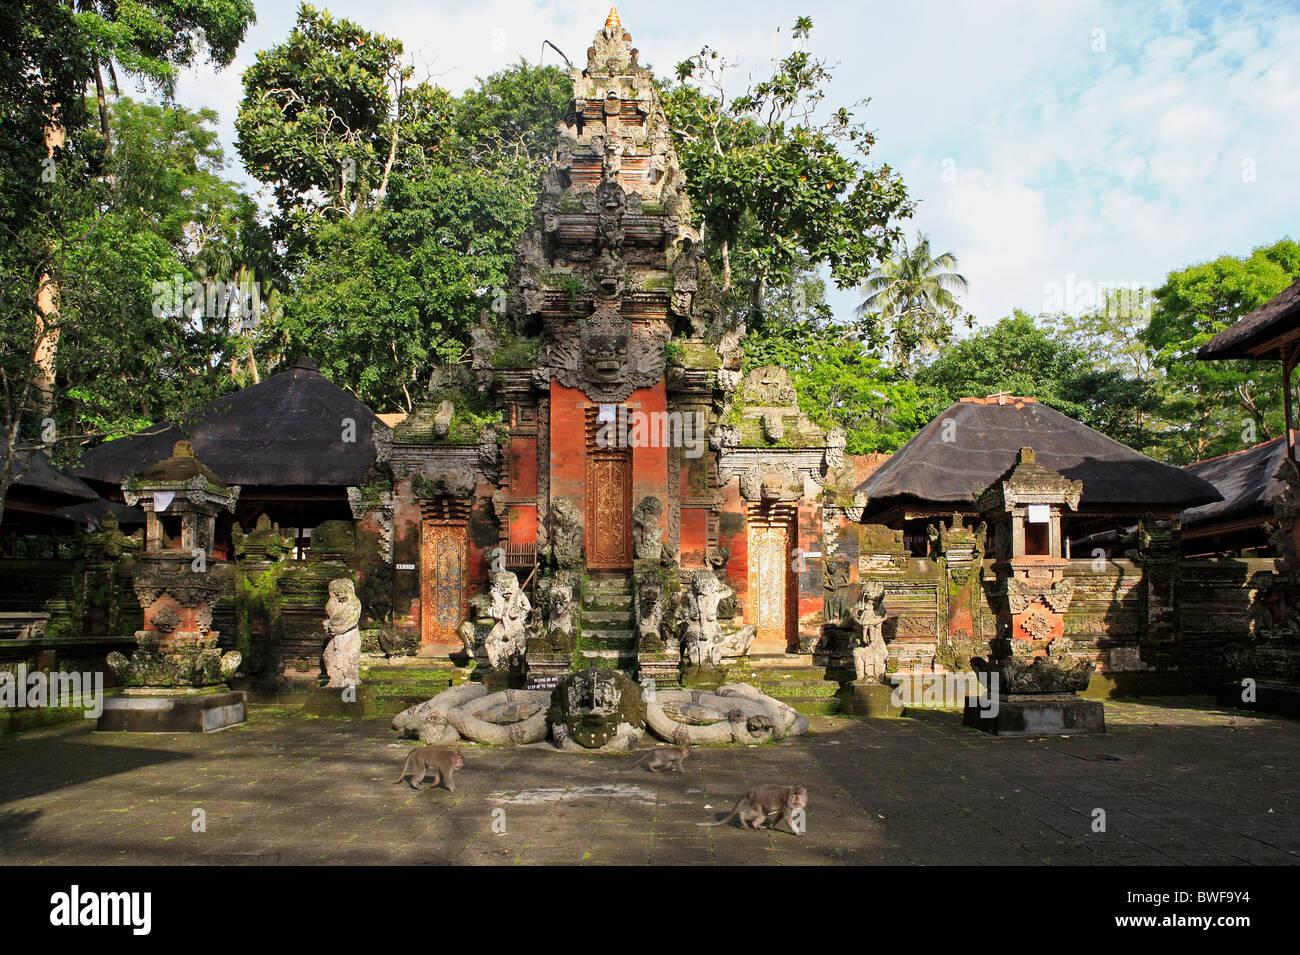 Pura Dalem Agung Temple. Sacred Monkey Forest Sanctuary, Padangtegal, Ubud, Bali. - Stock Image